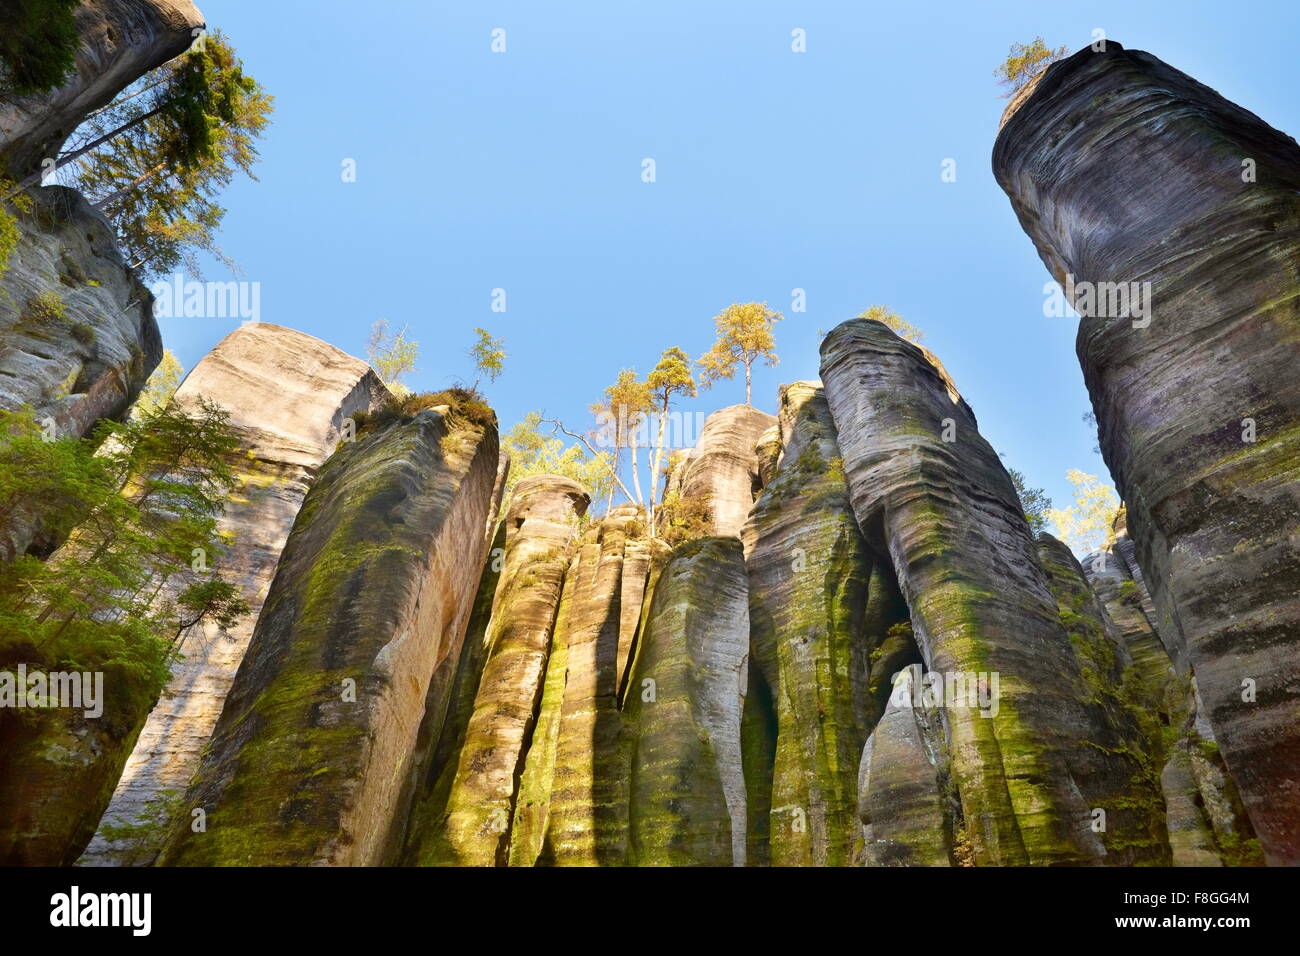 Adrspach Rock Town, Teplicke Rocks, Czech Republic - Stock Image